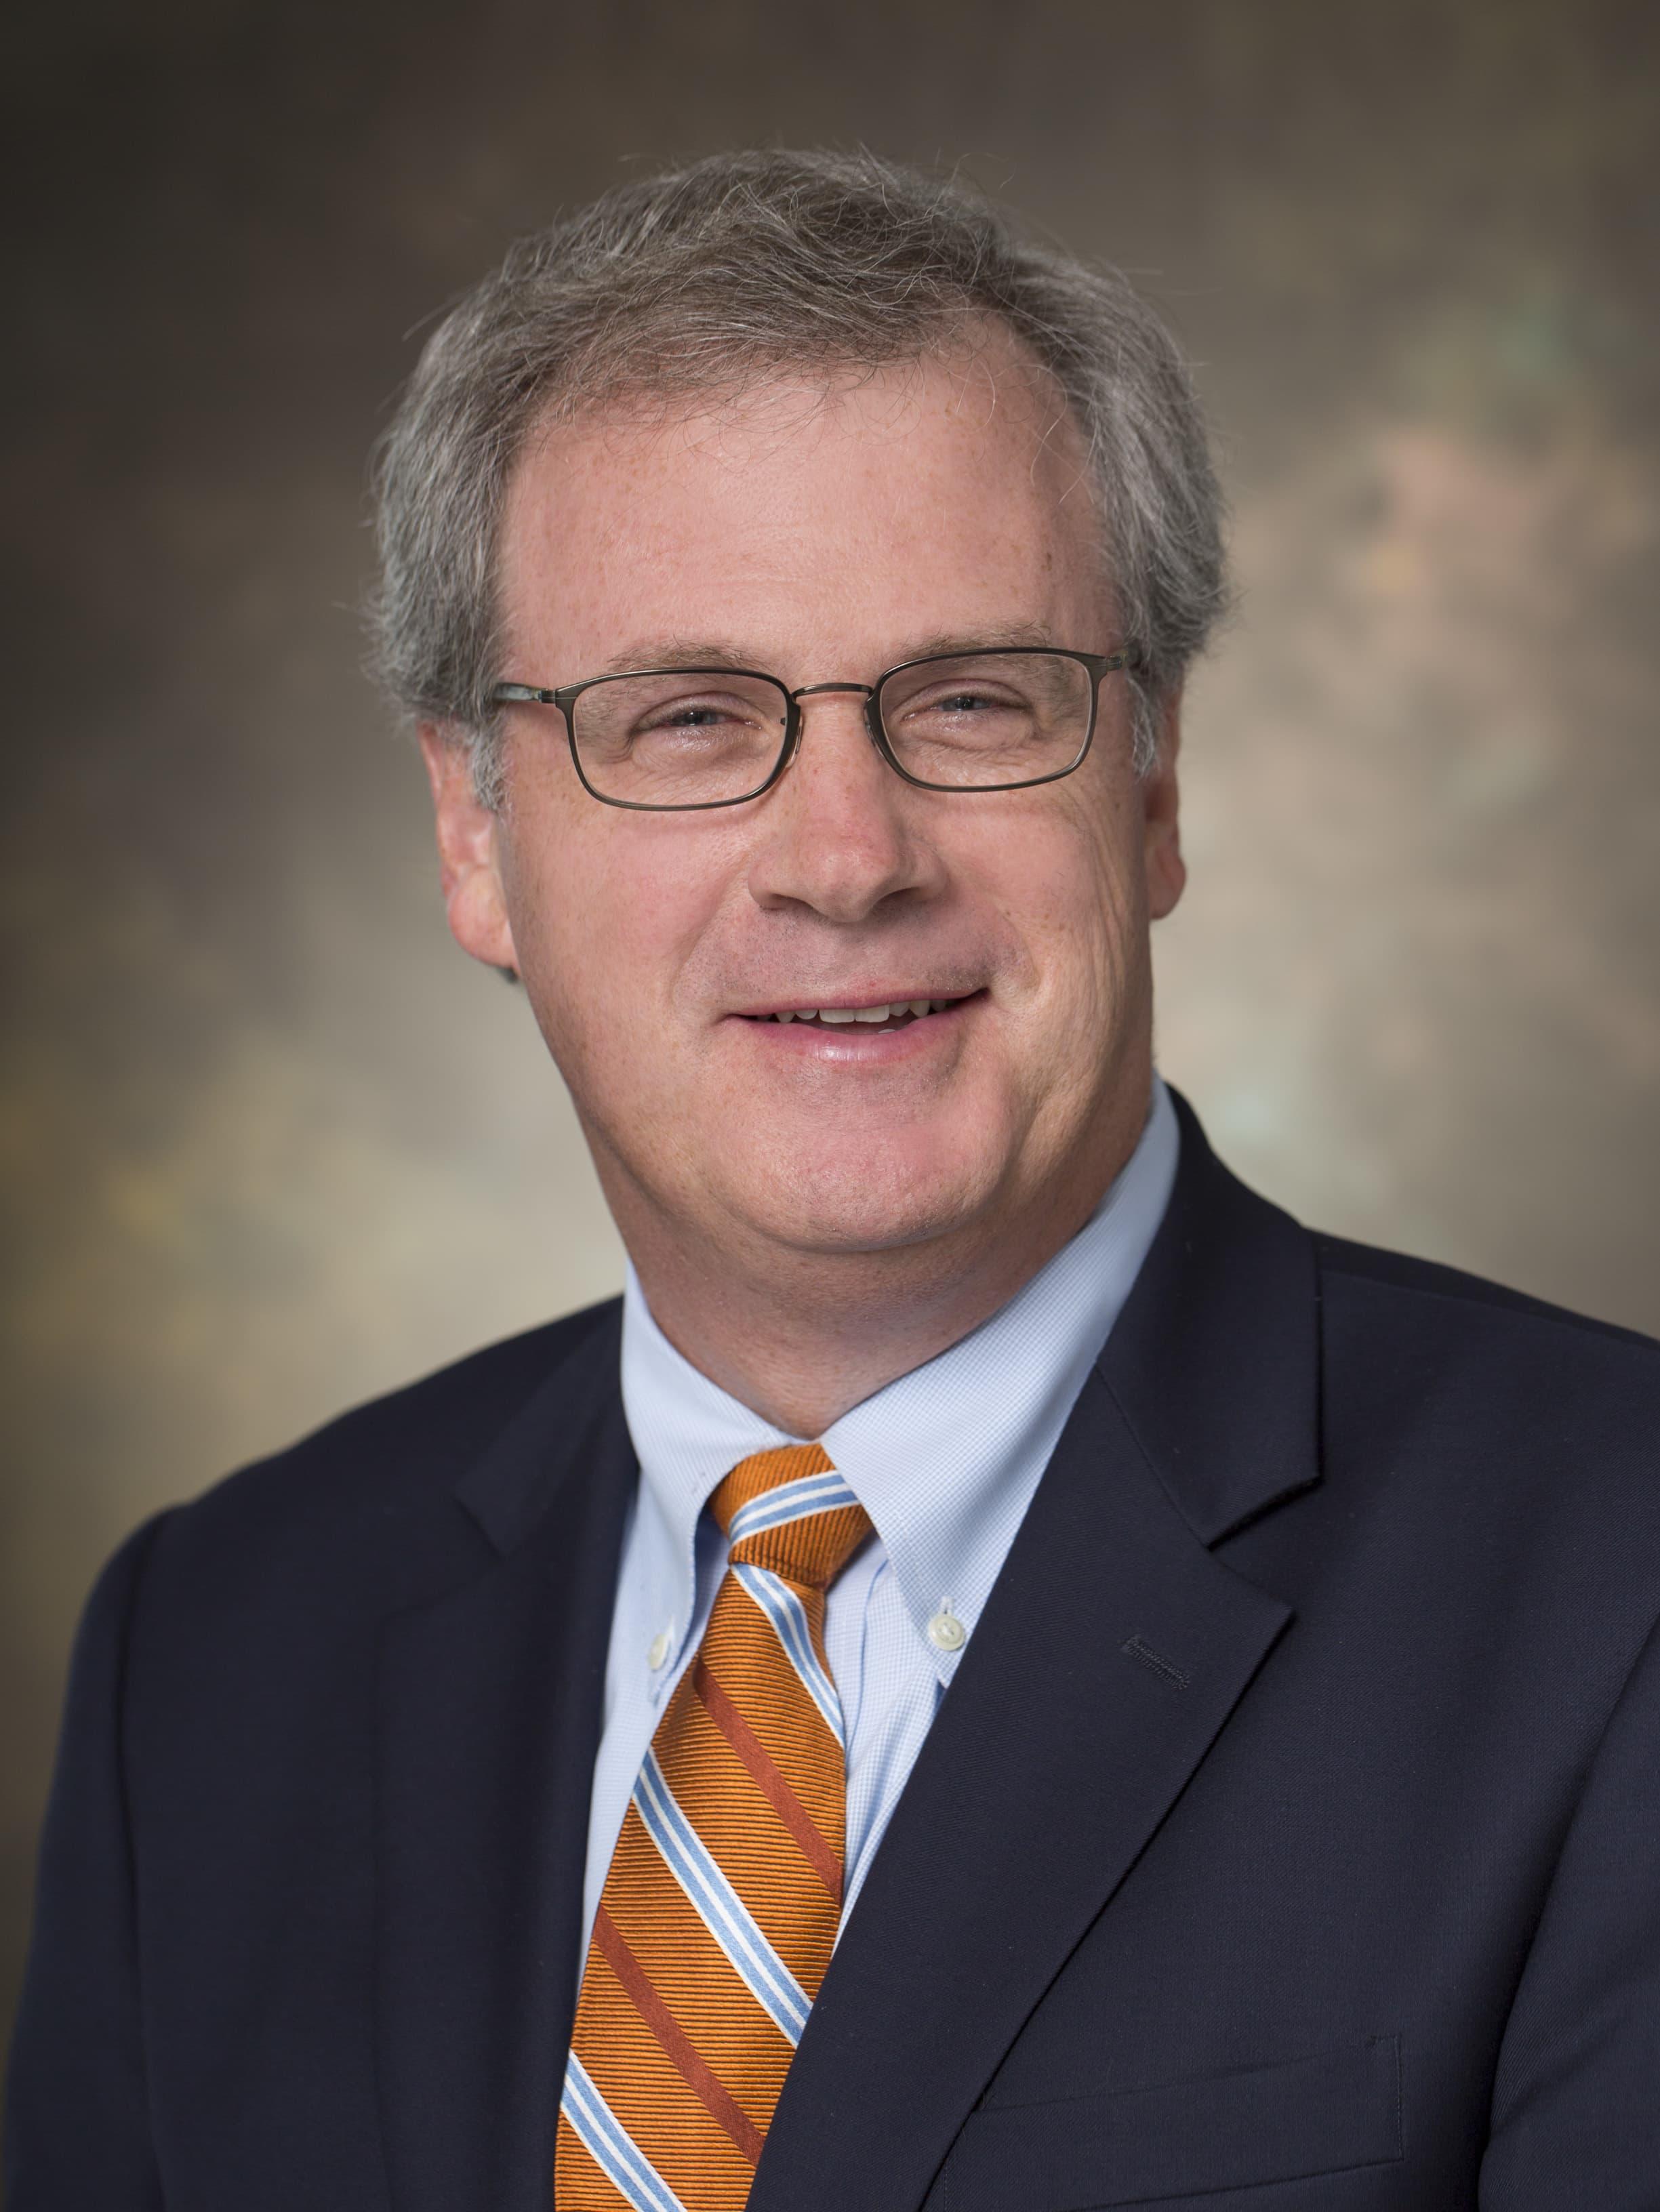 Thomas M. Buckley